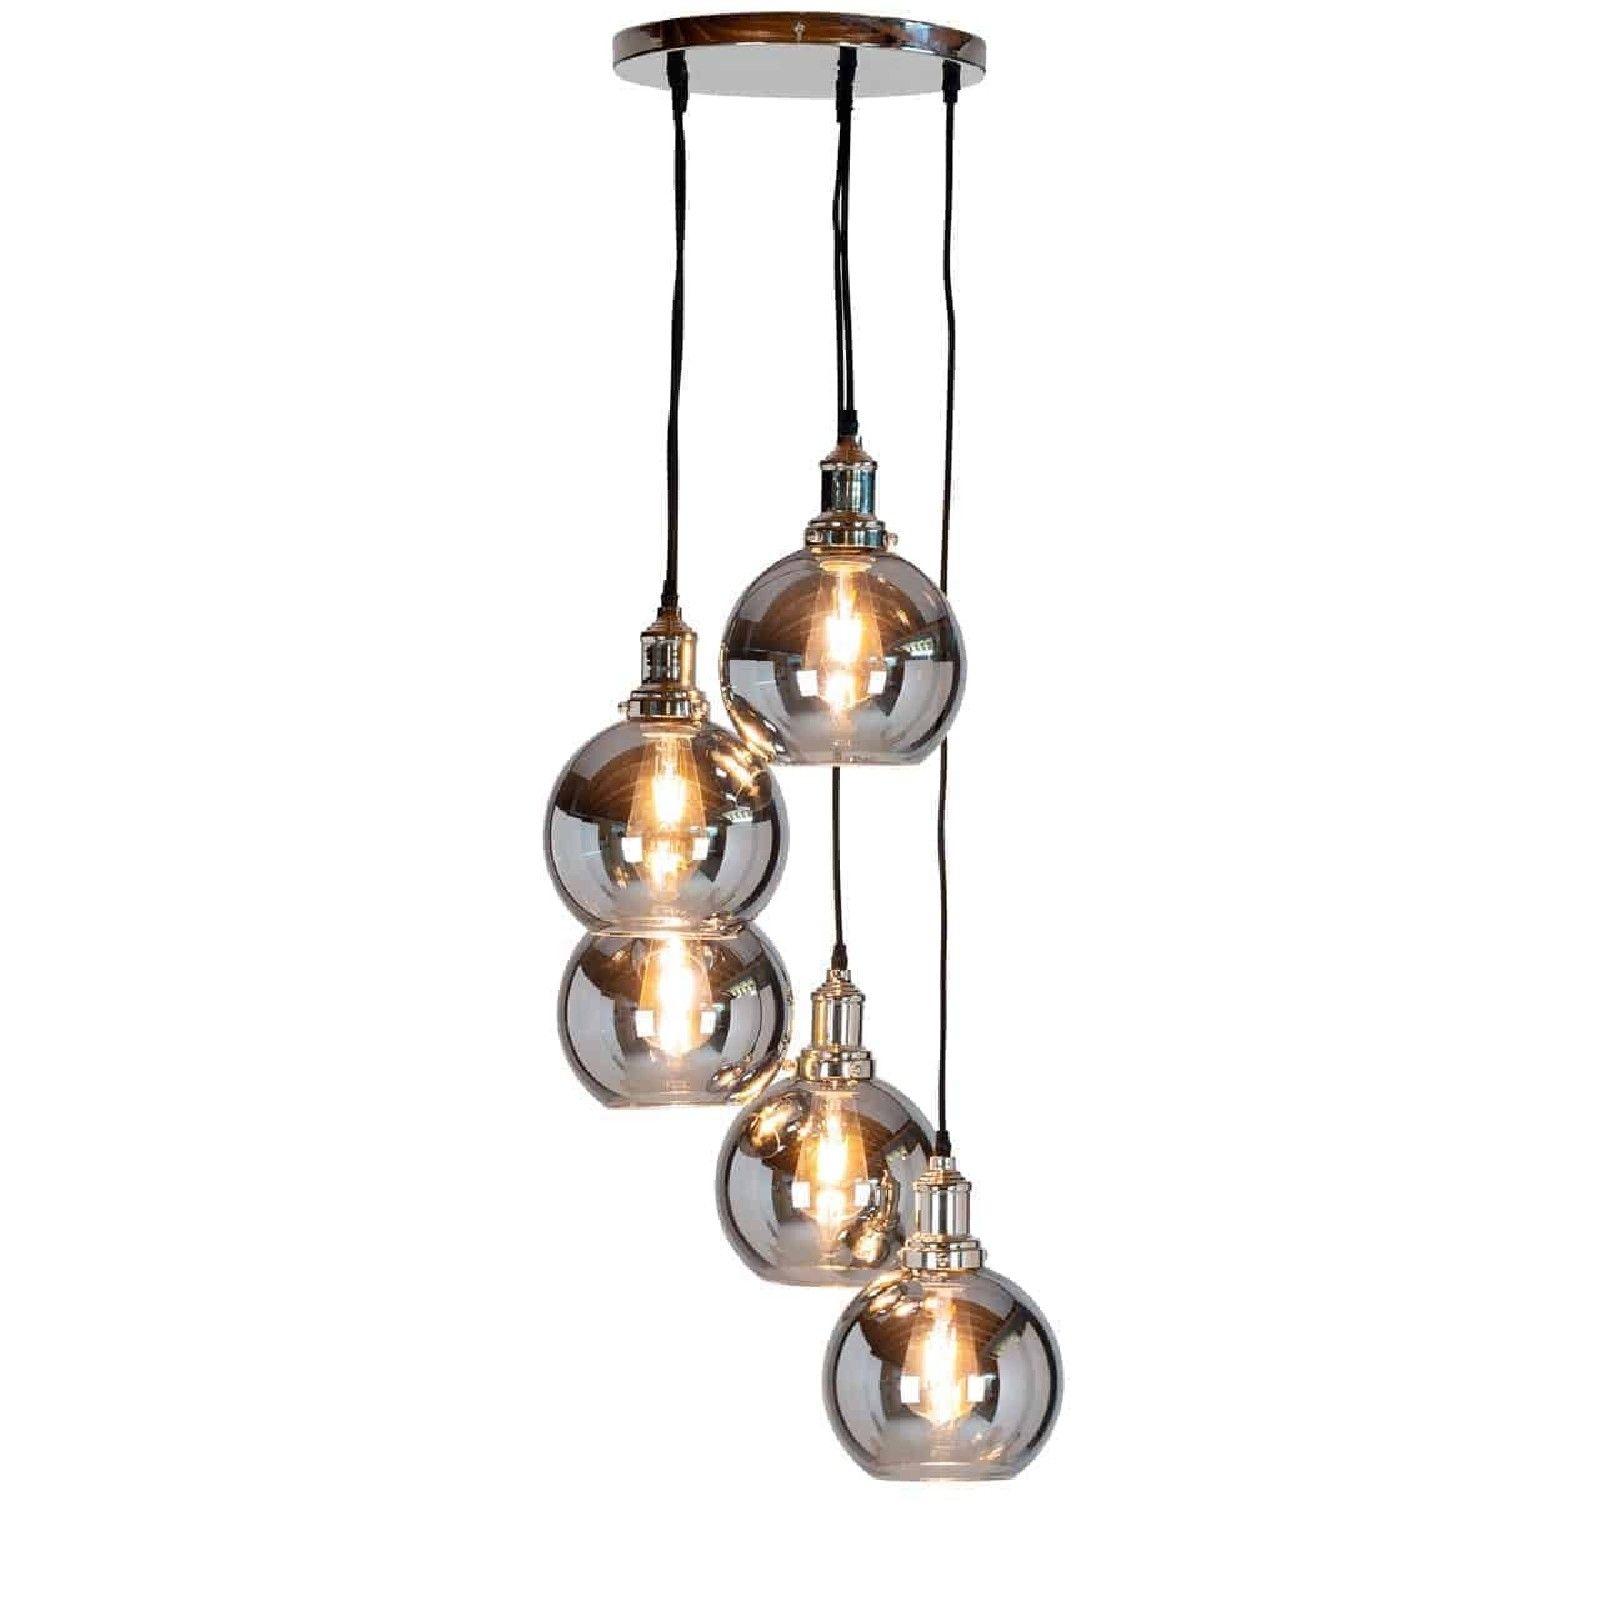 Lampe suspendue CamdonE27 / 60 watt (5 pieces) Suspensions et plafonniers - 9